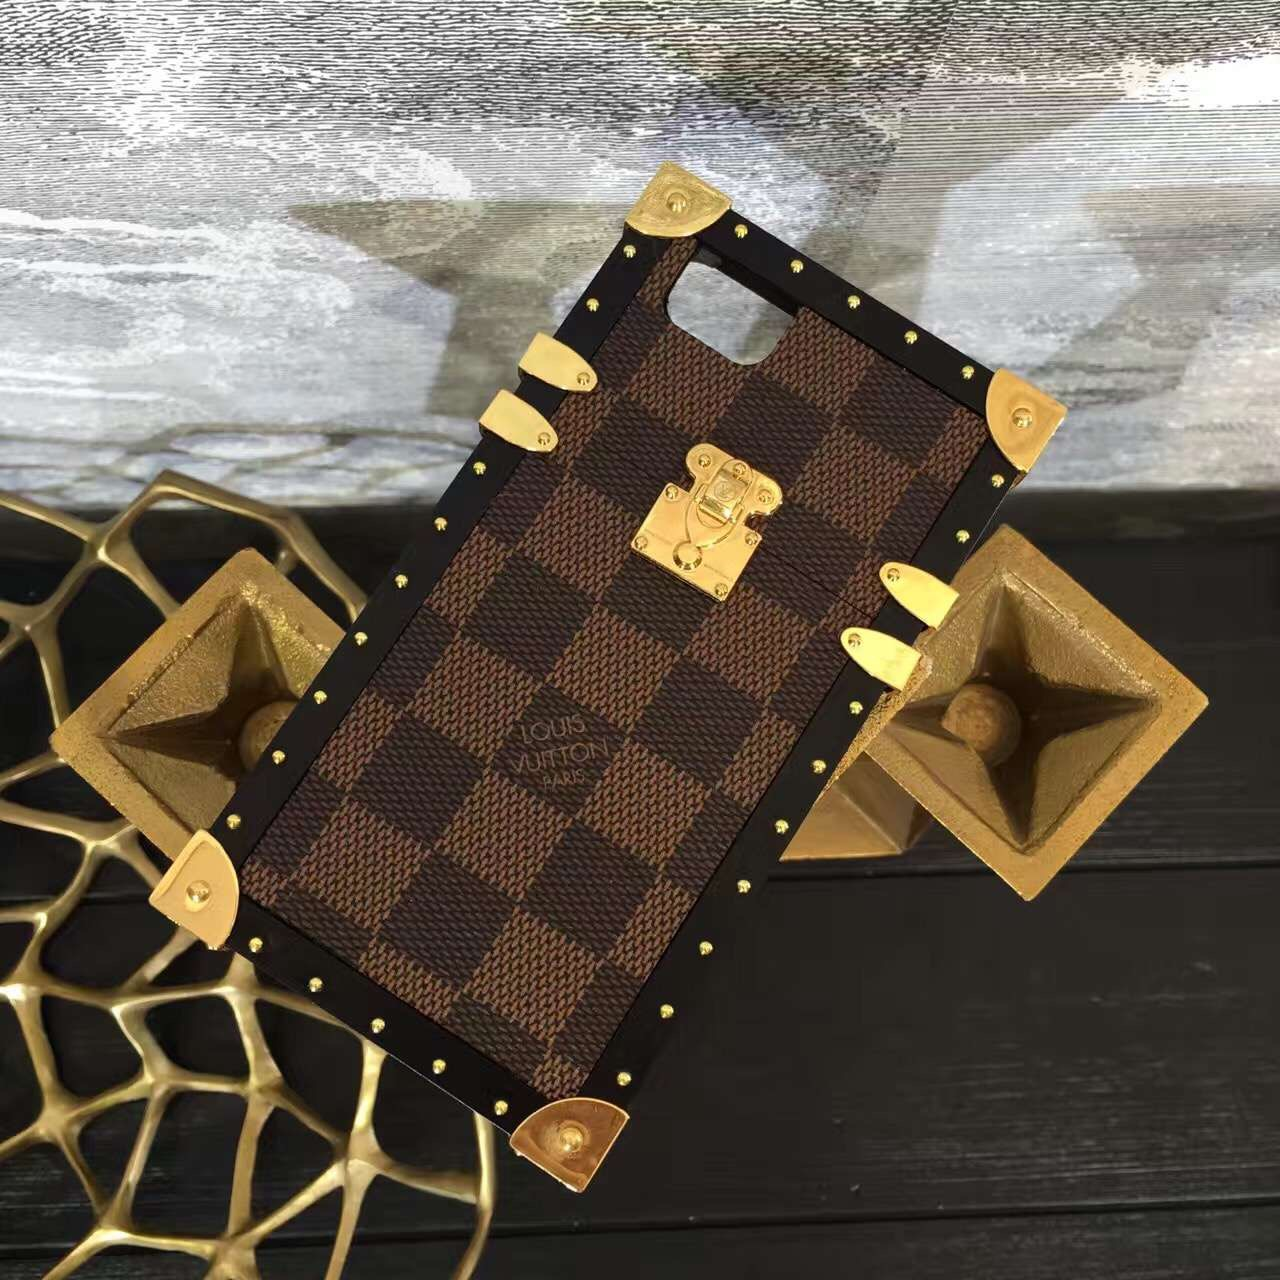 2017 Louis Vuitton Petite Malle iPhone 7/6 Case Brown